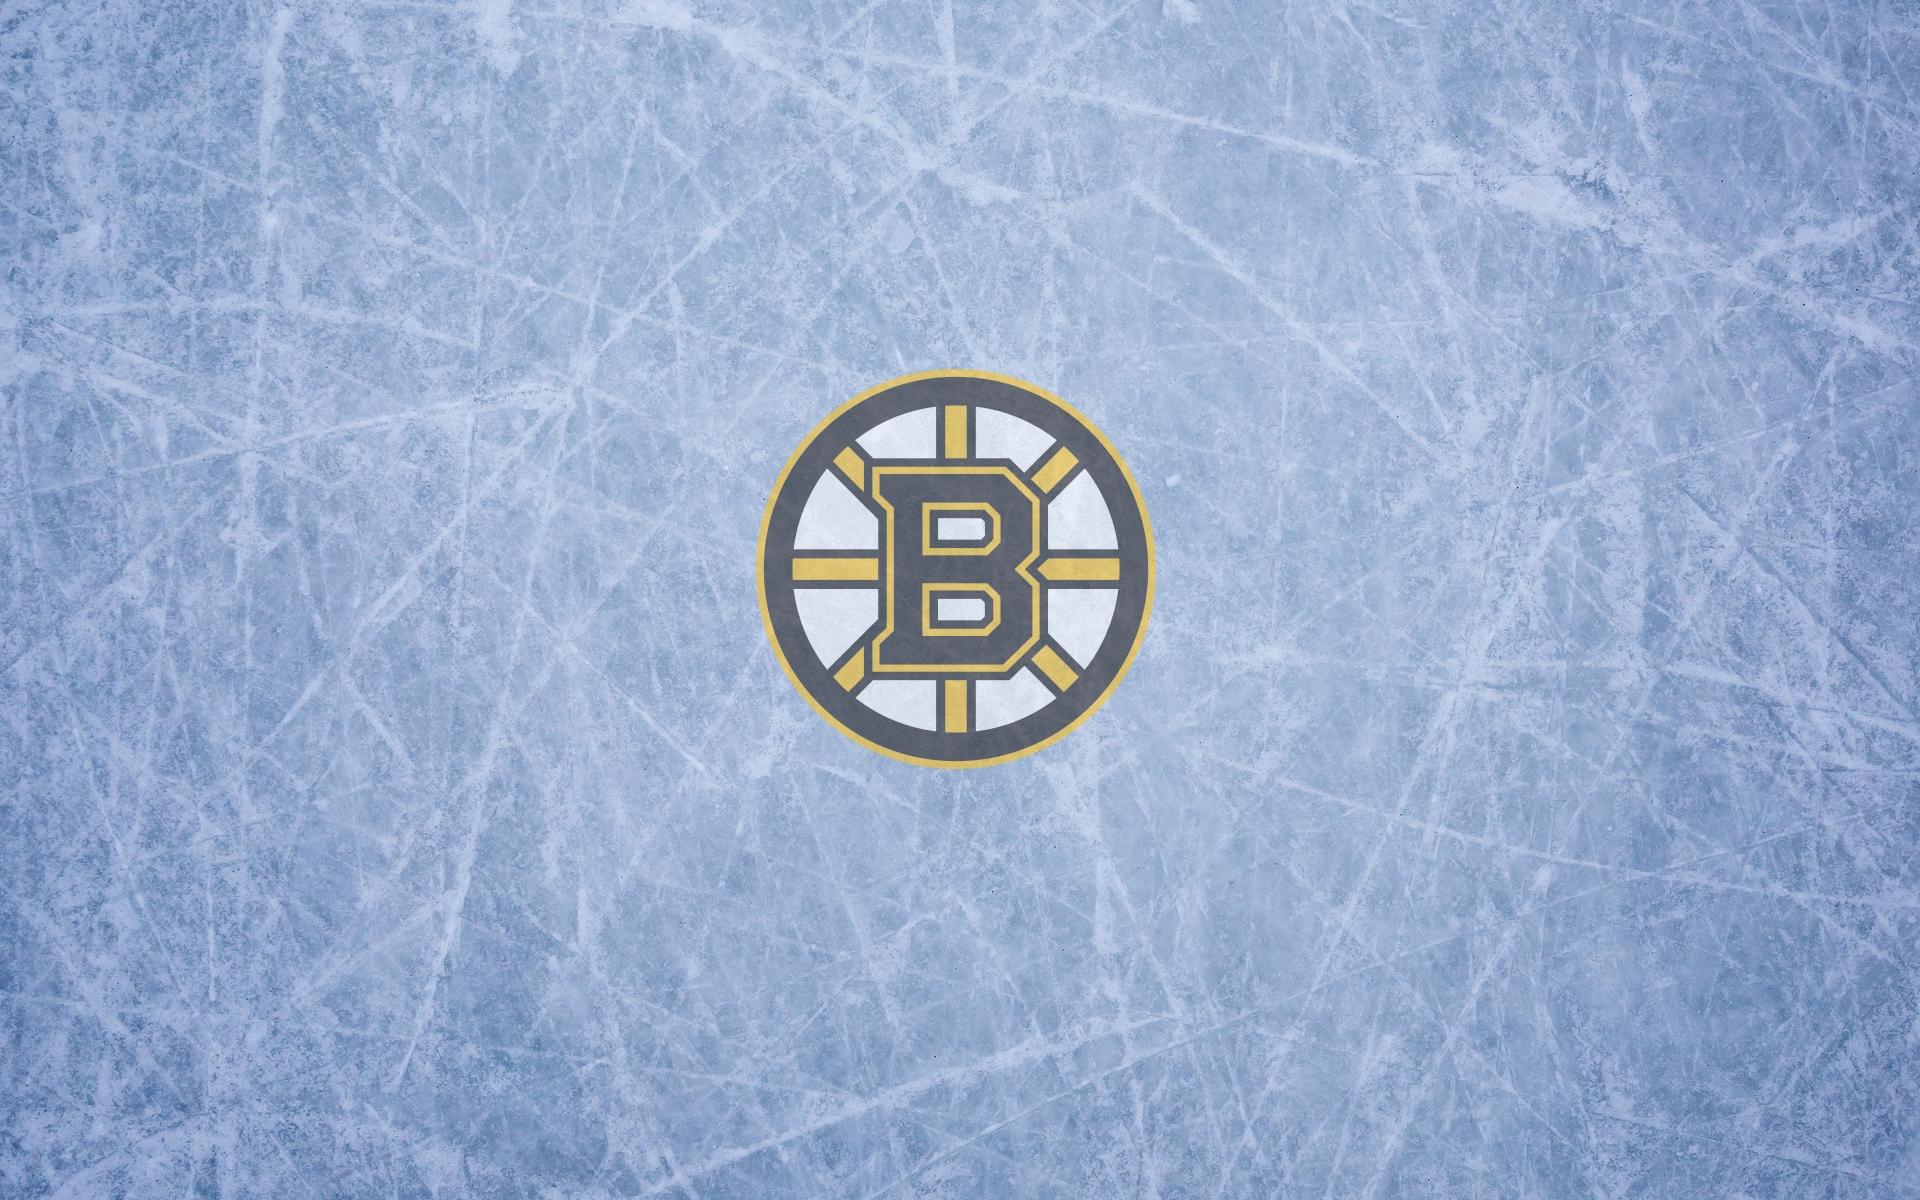 Boston Bruins HD Wallpaper   Background